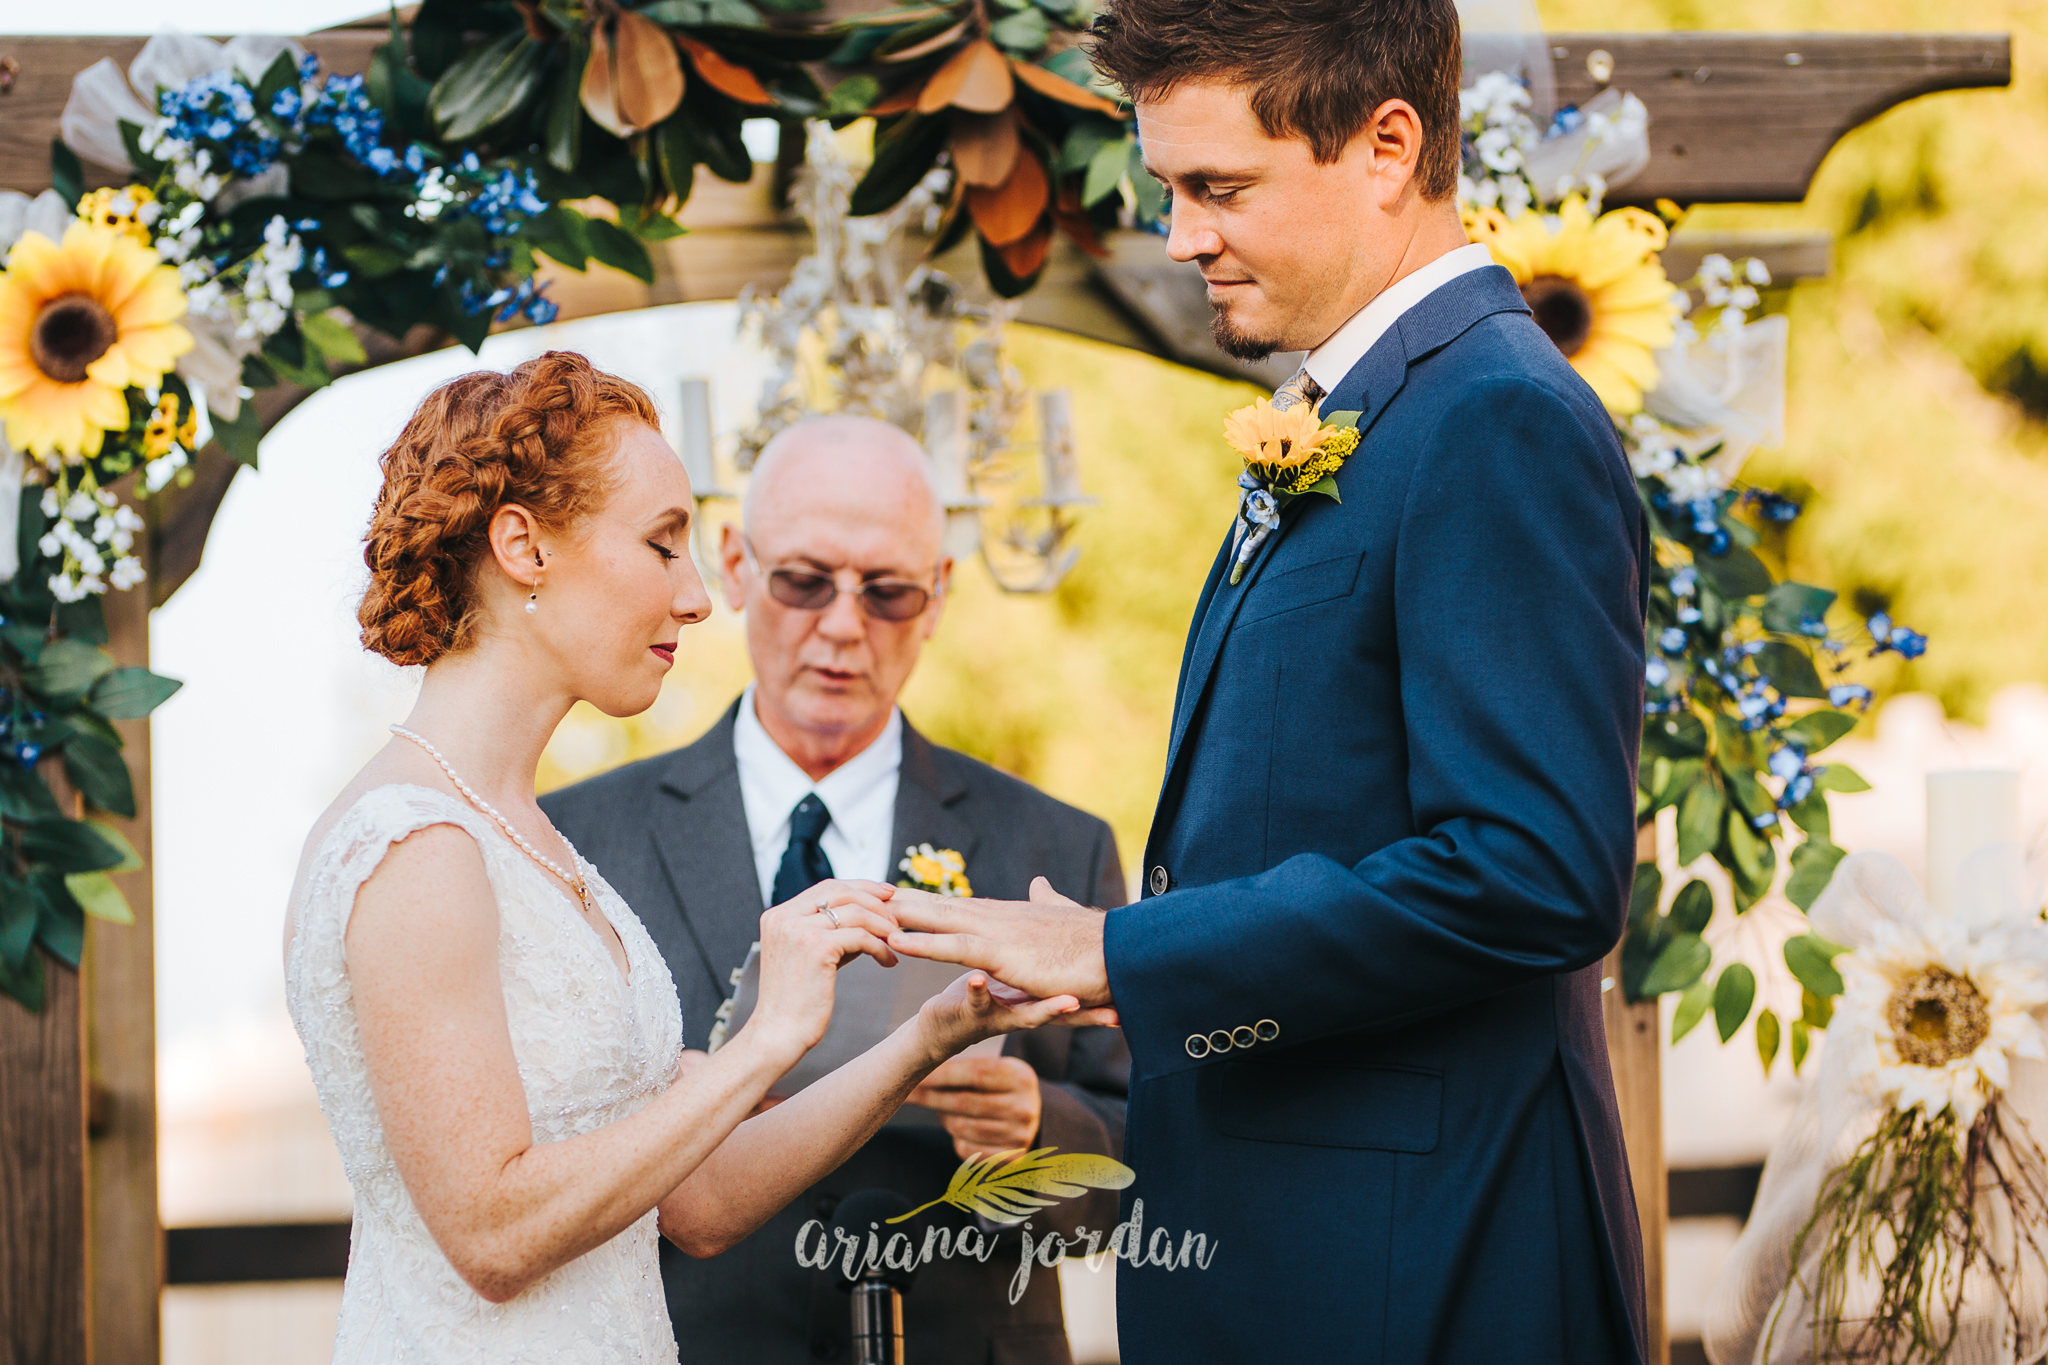 074 Ariana Jordan Photography -Moonlight Fields Lexington Ky Wedding Photographer 4642.jpg